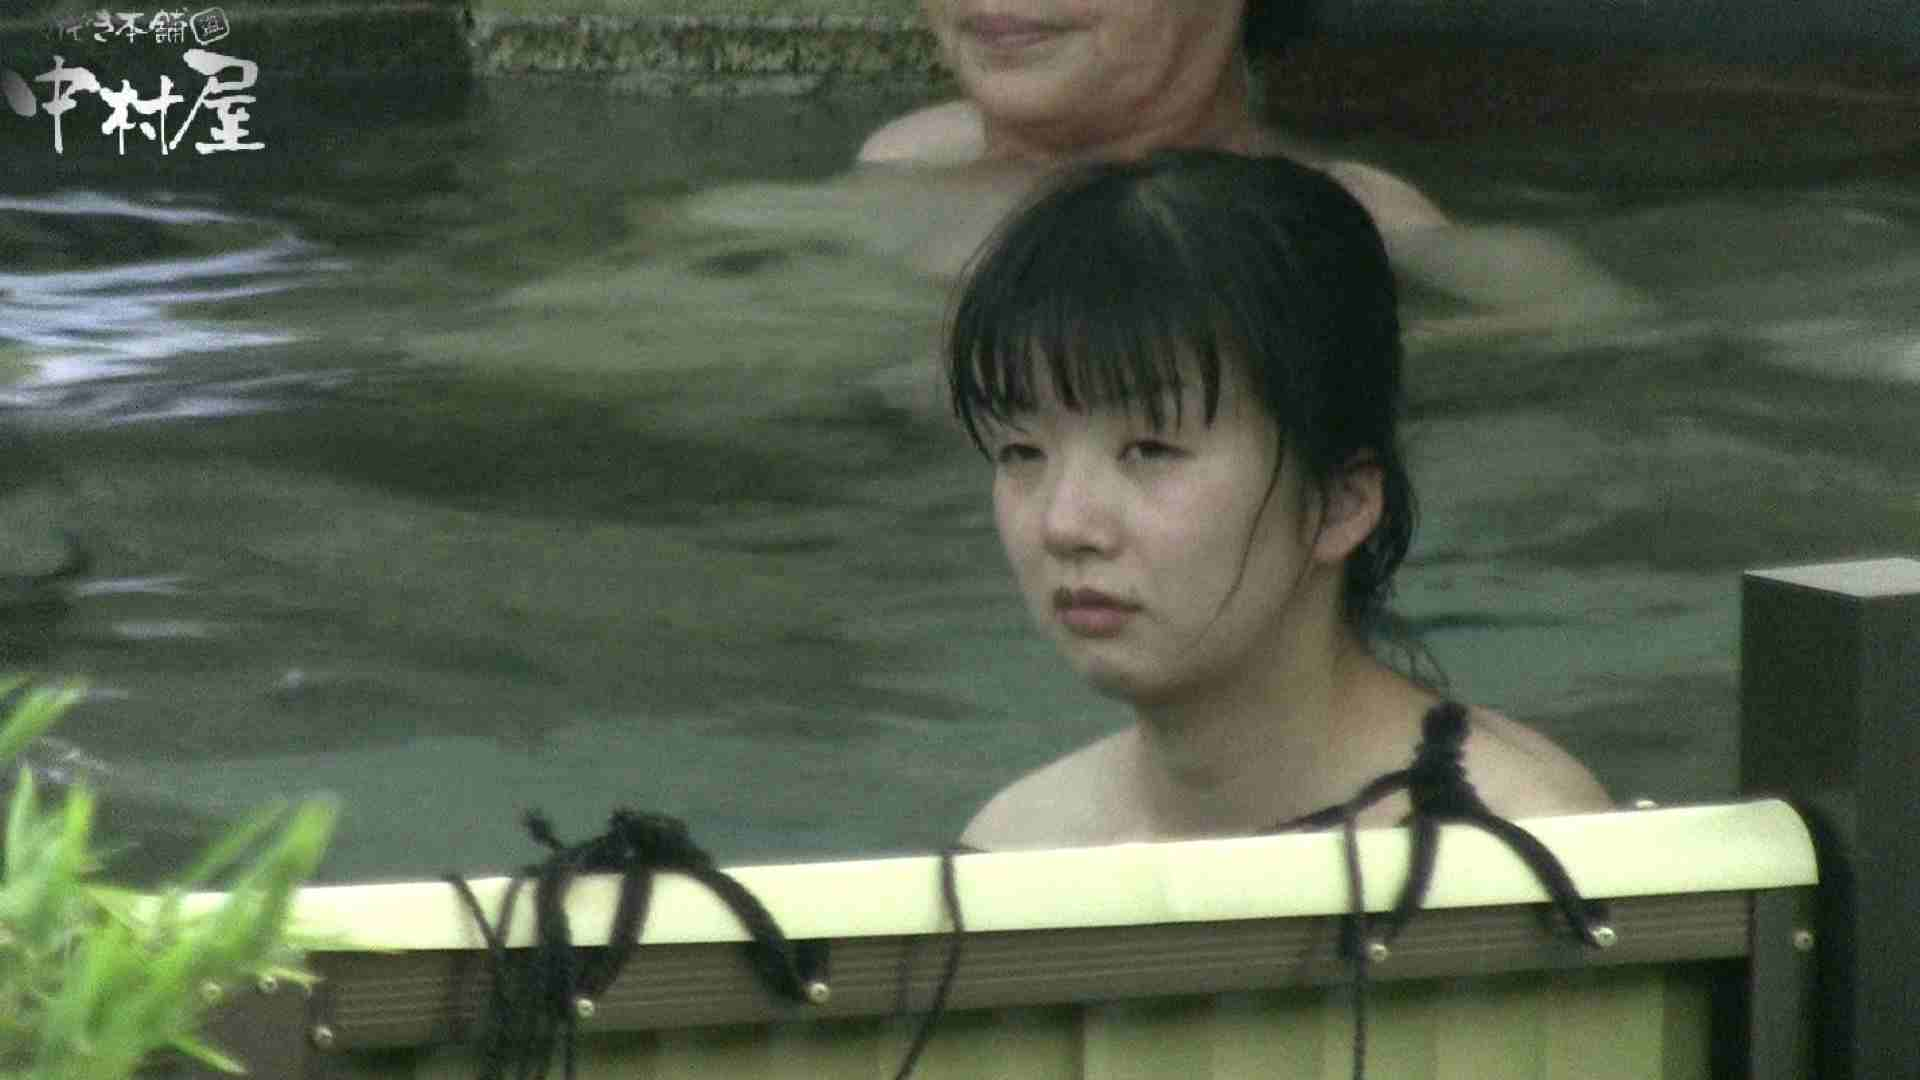 Aquaな露天風呂Vol.904 盗撮師作品  103pic 27